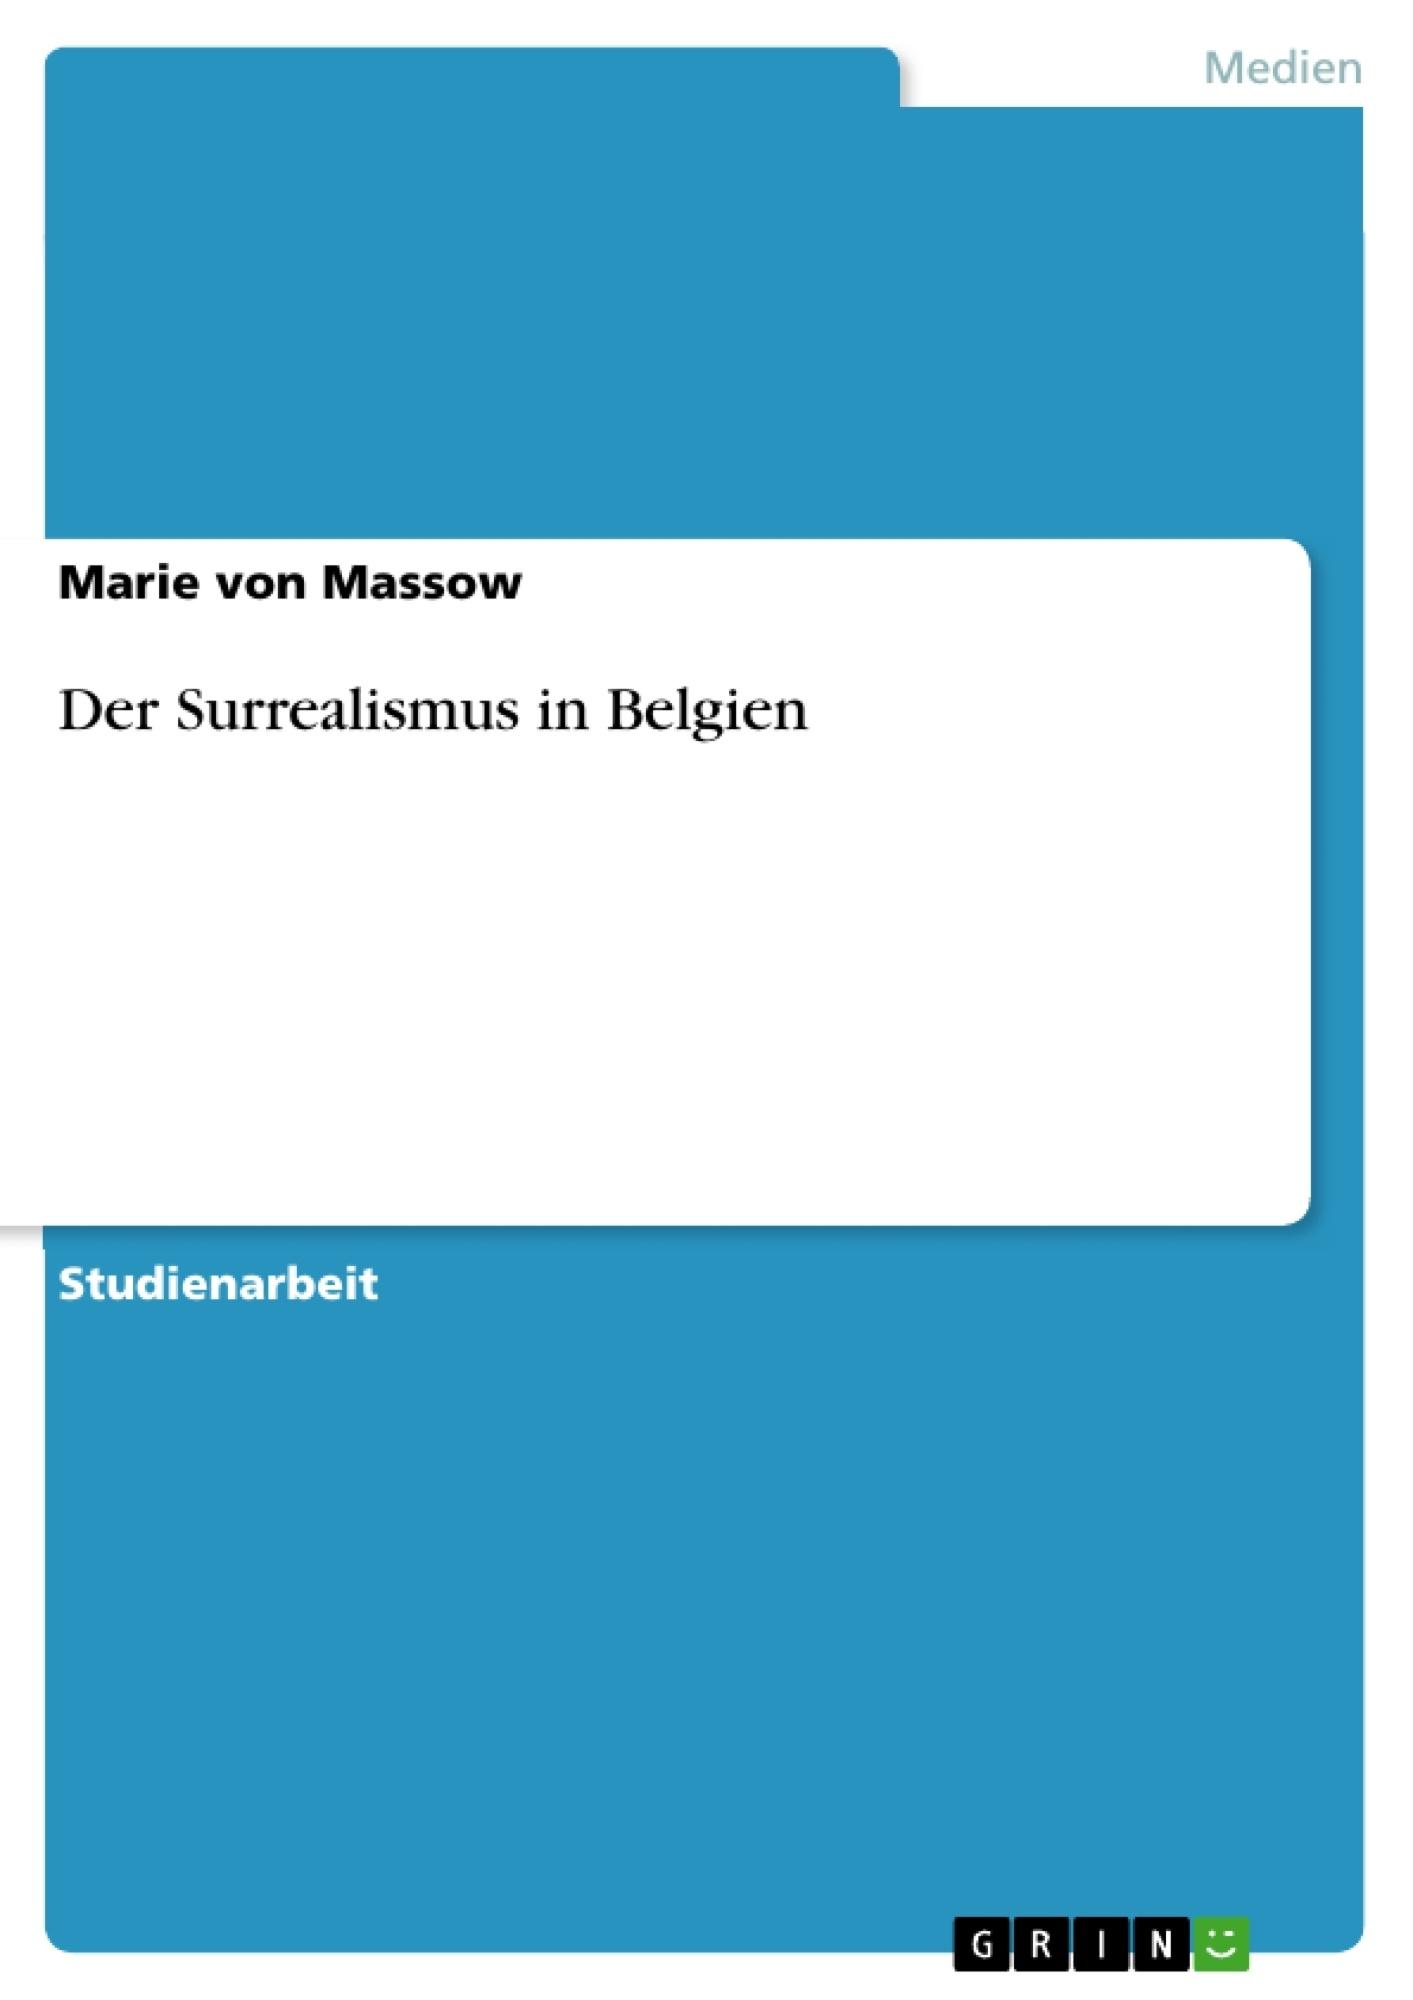 Titel: Der Surrealismus in Belgien